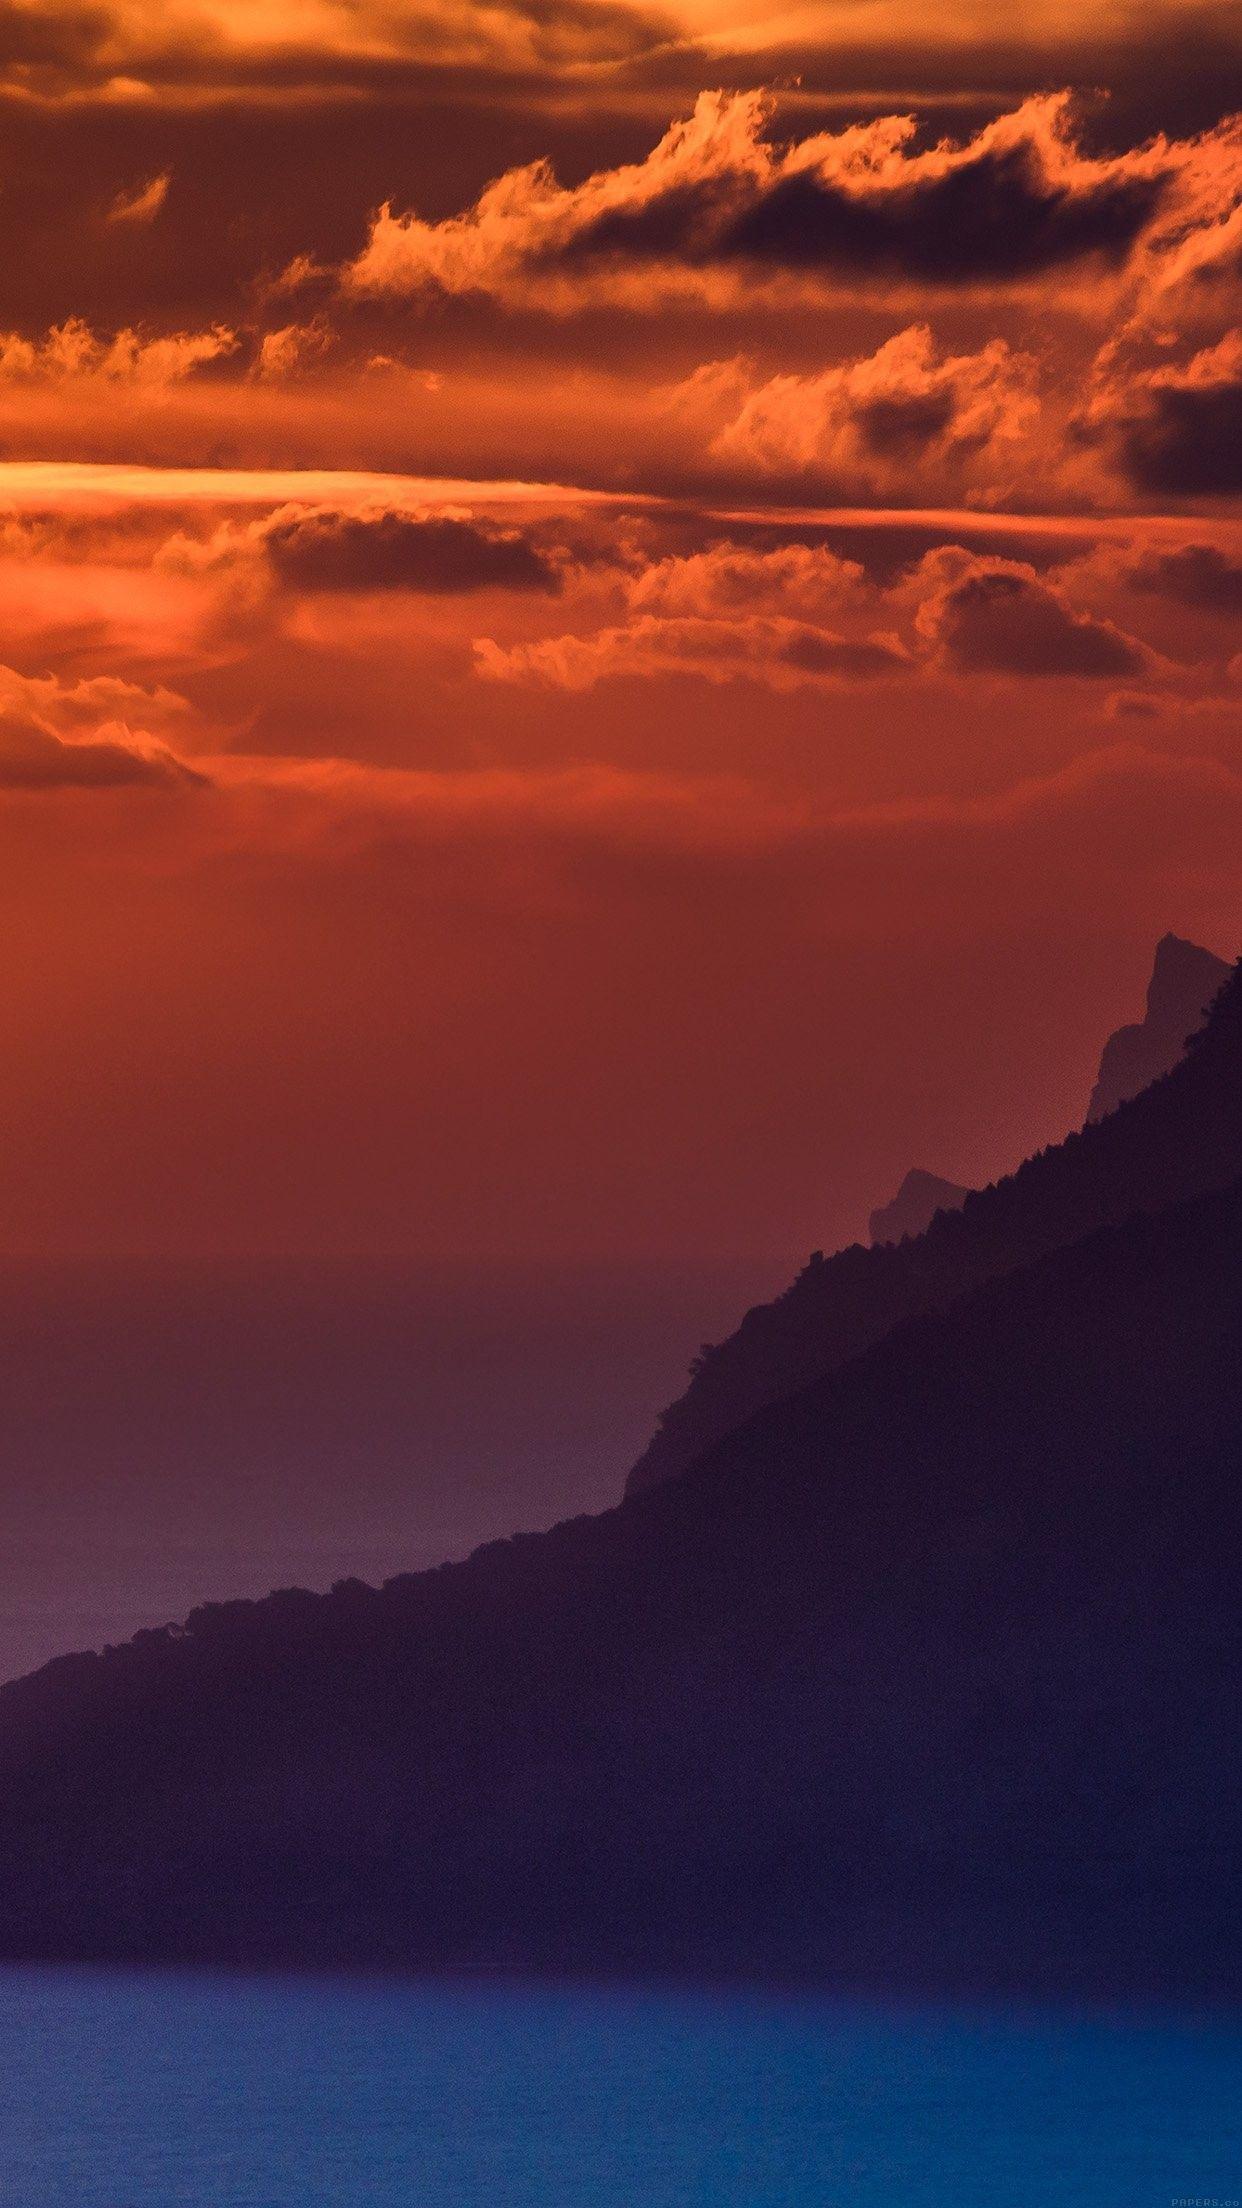 iOS 11, iPhone X, ocean, sky, sunset, orange, coast